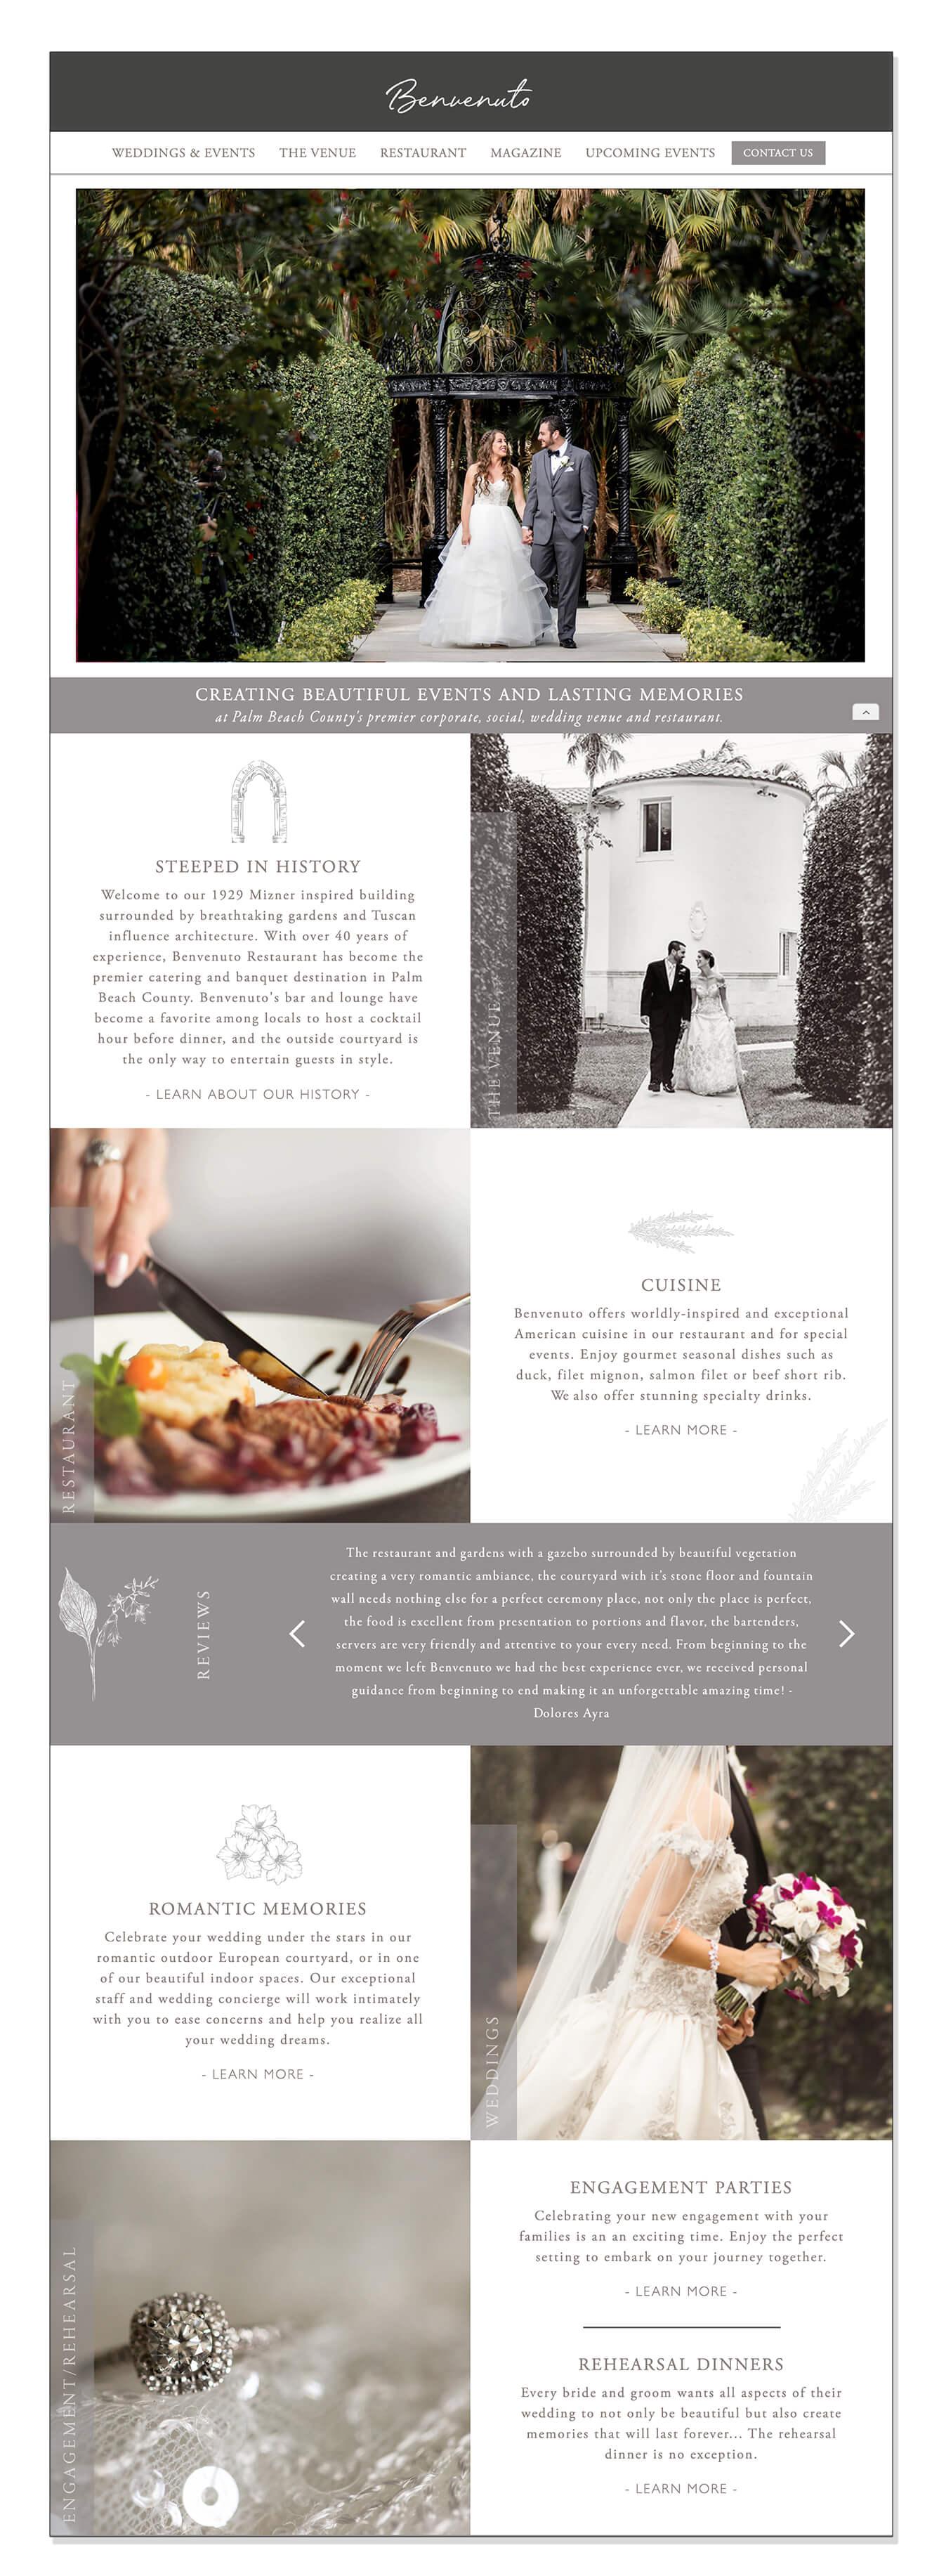 wedding venue new website